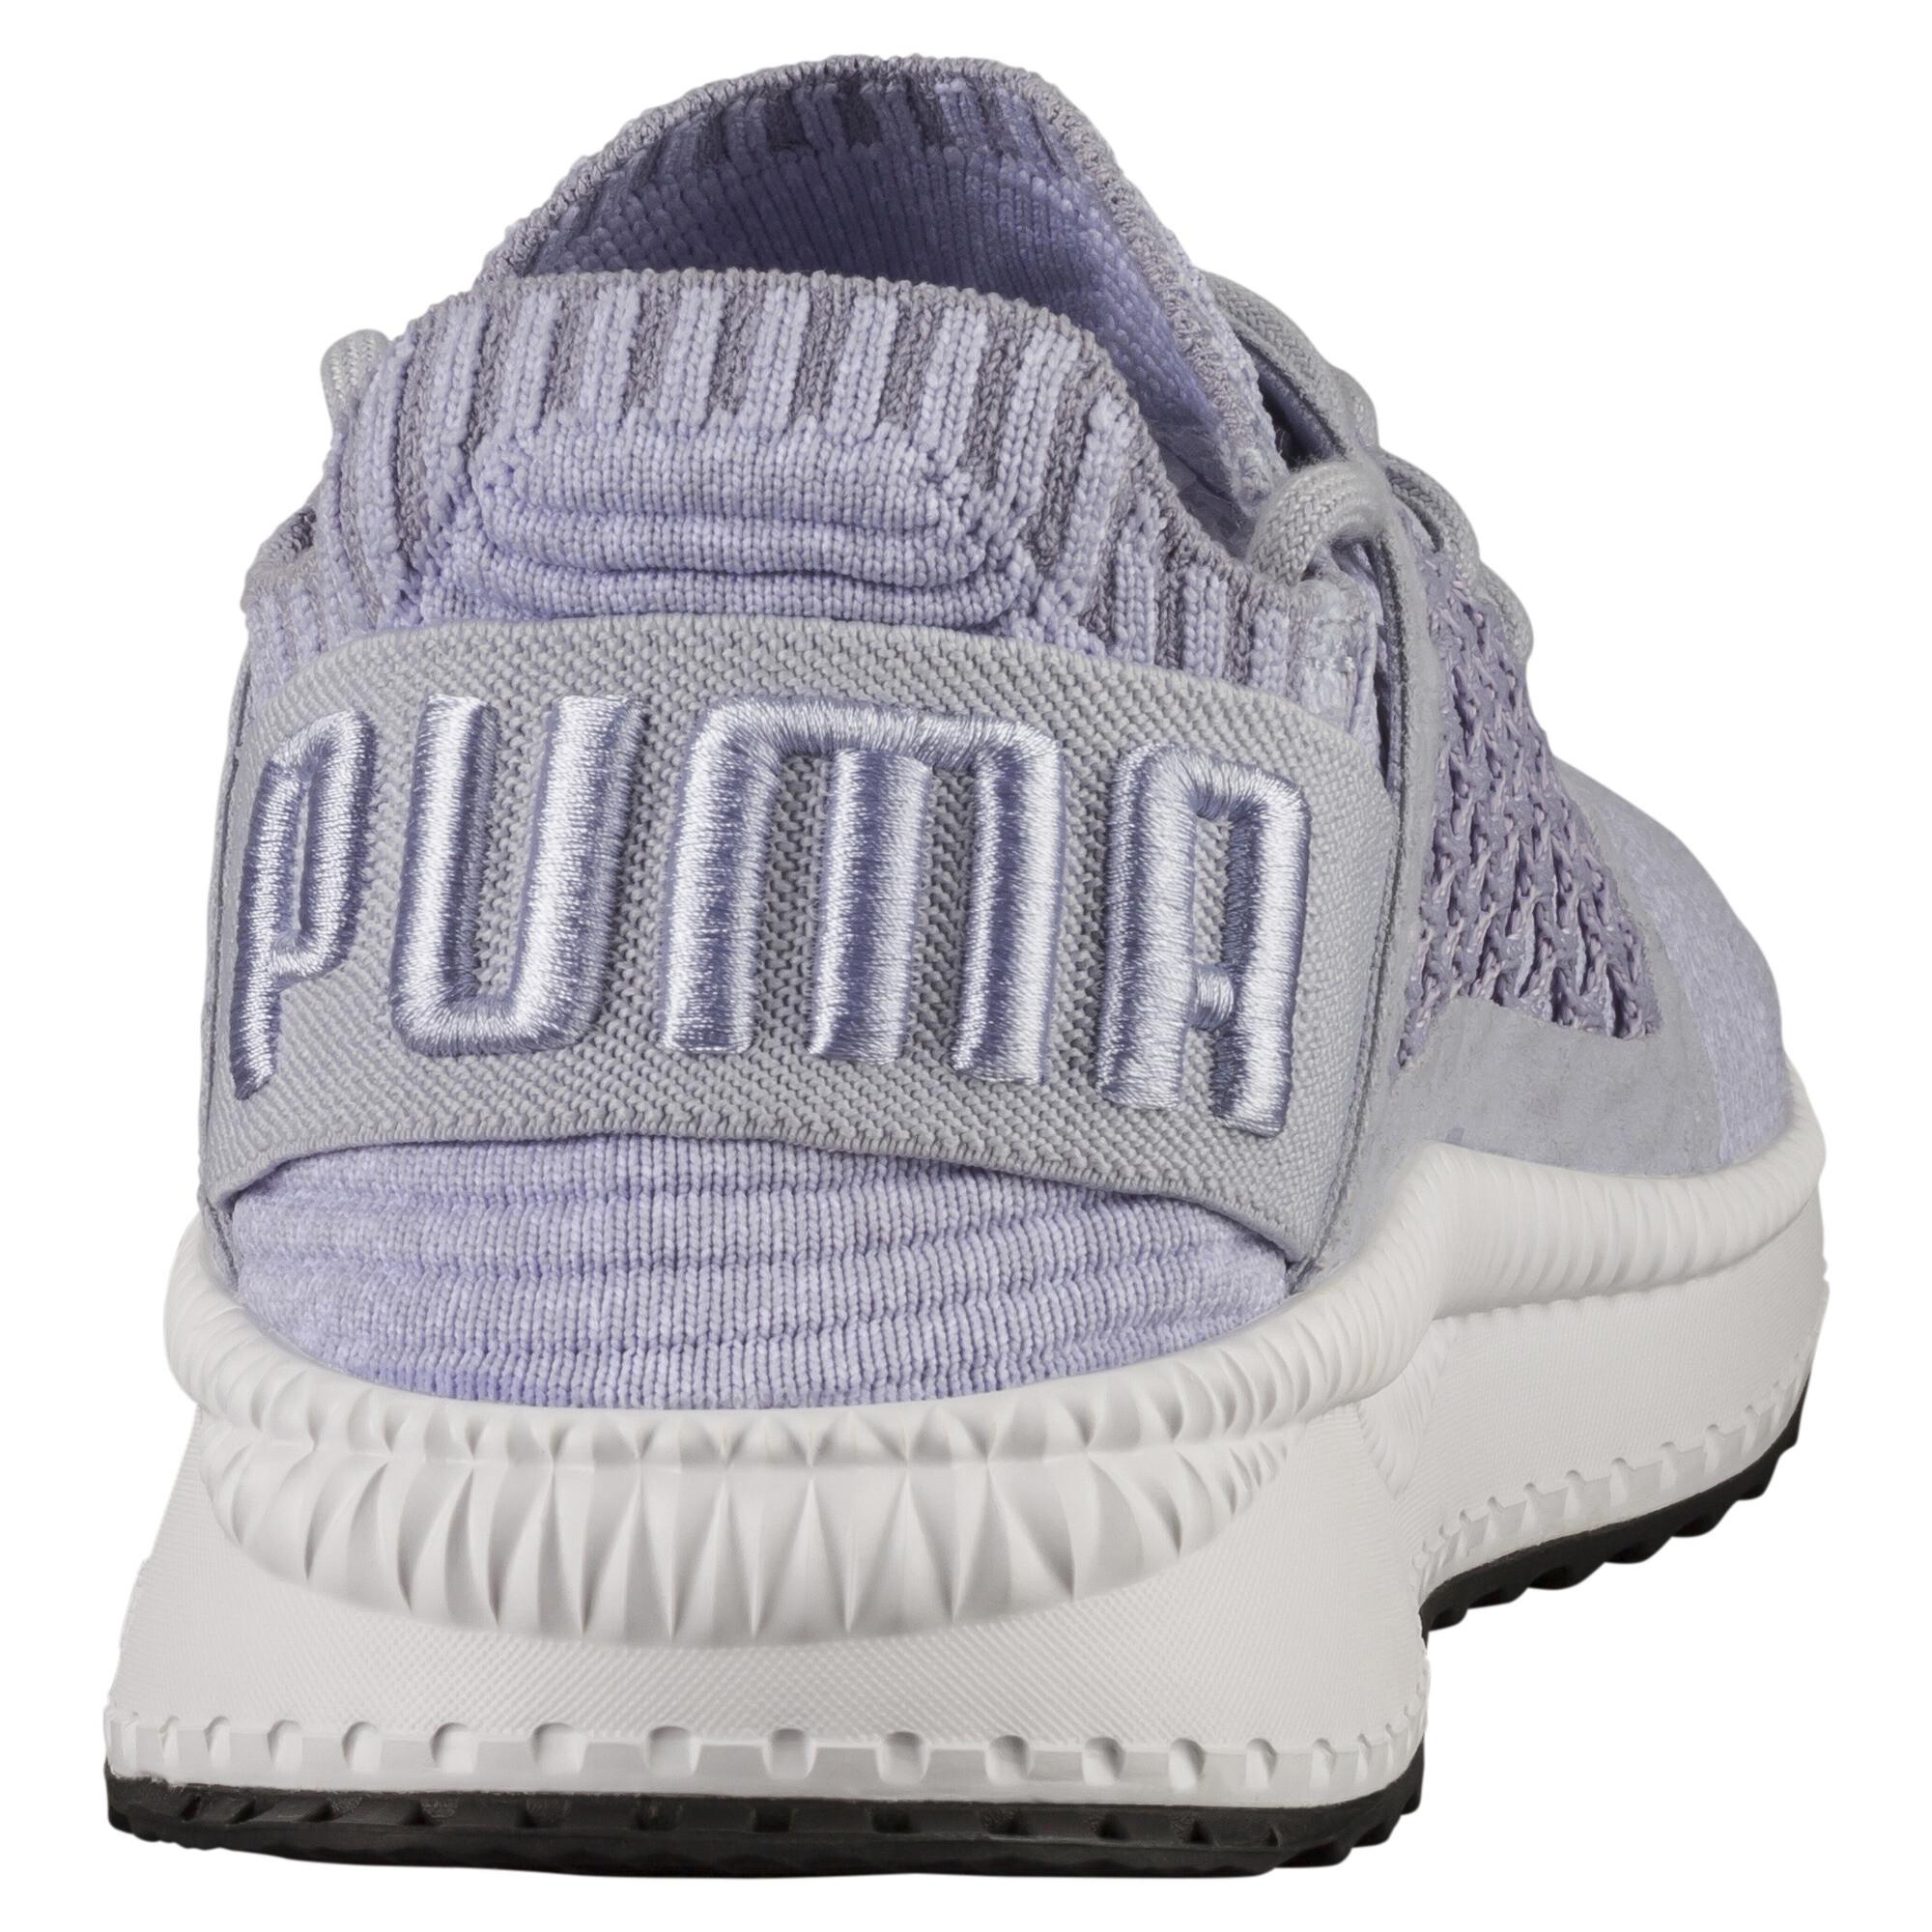 PUMA-TSUGI-NETFIT-evoKNIT-Sneaker-Frauen-Schuhe-Neu Indexbild 13